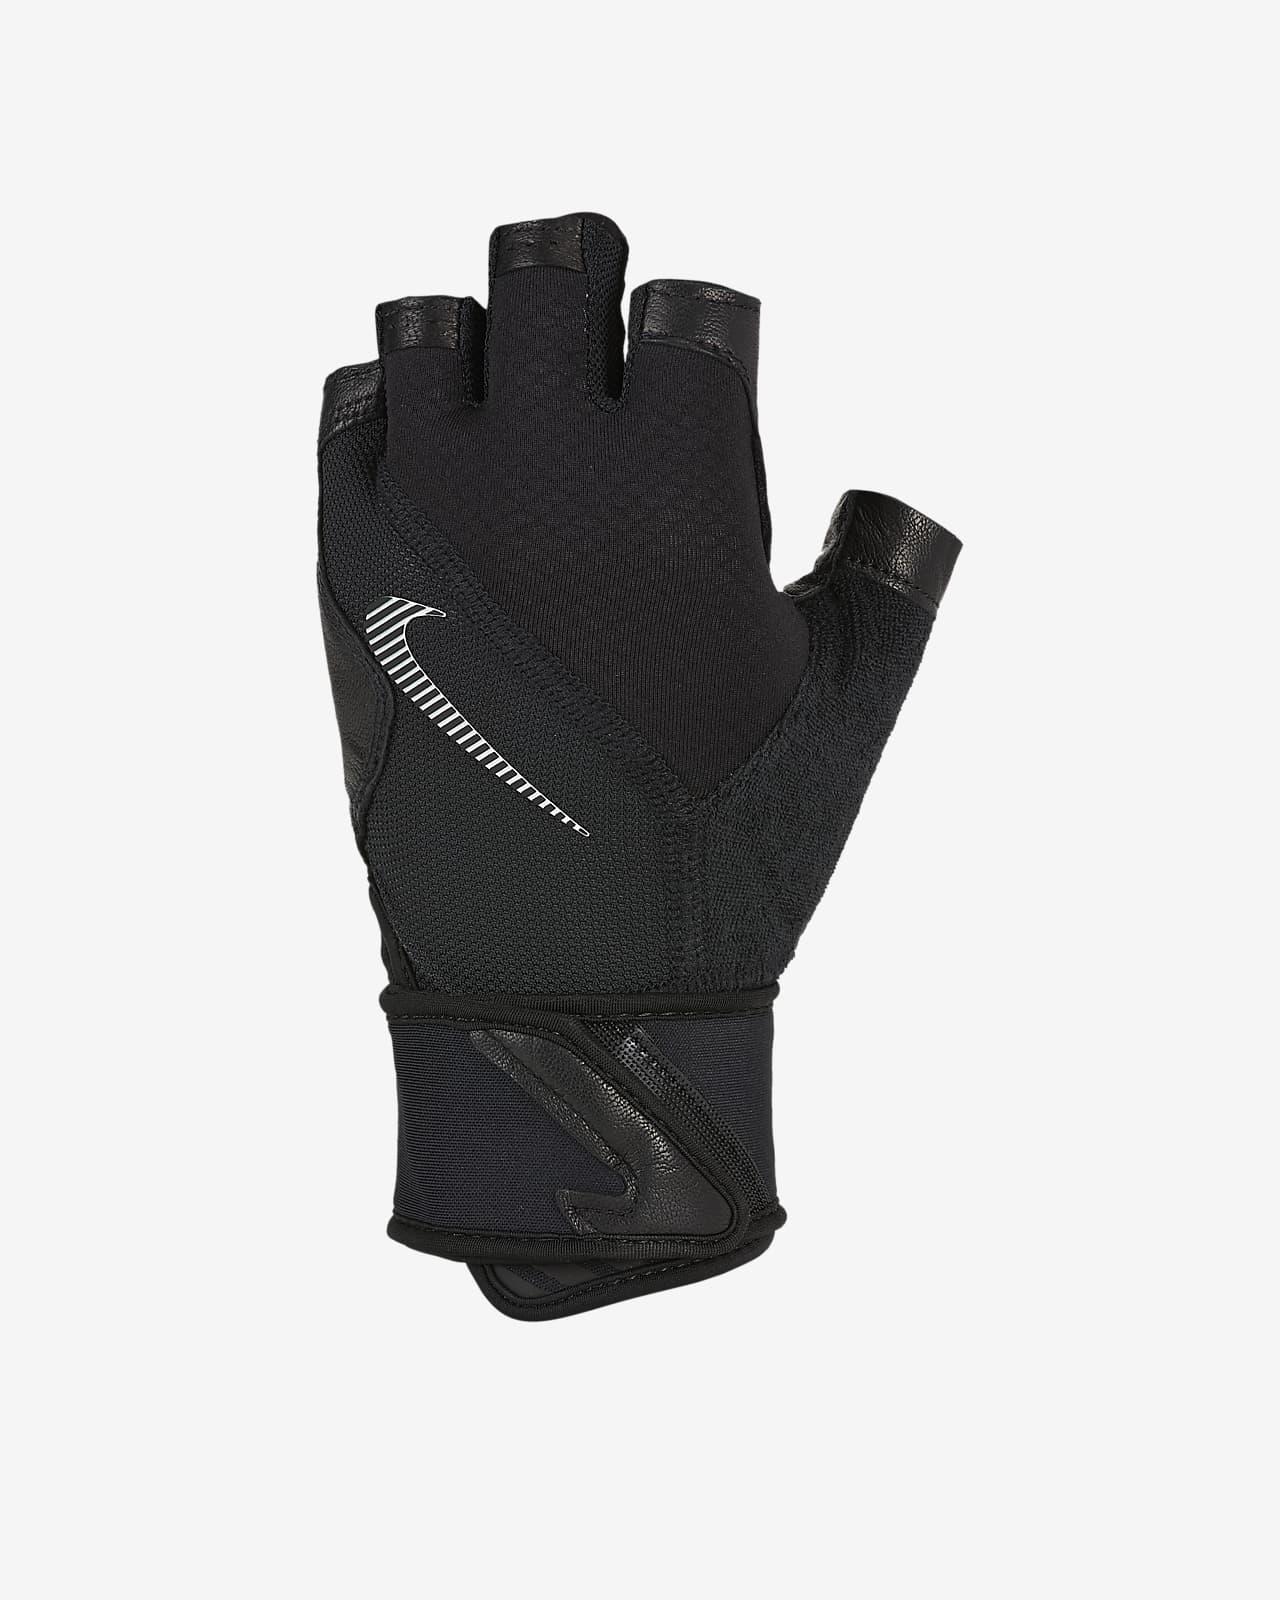 Nike Elevated Men's Training Gloves